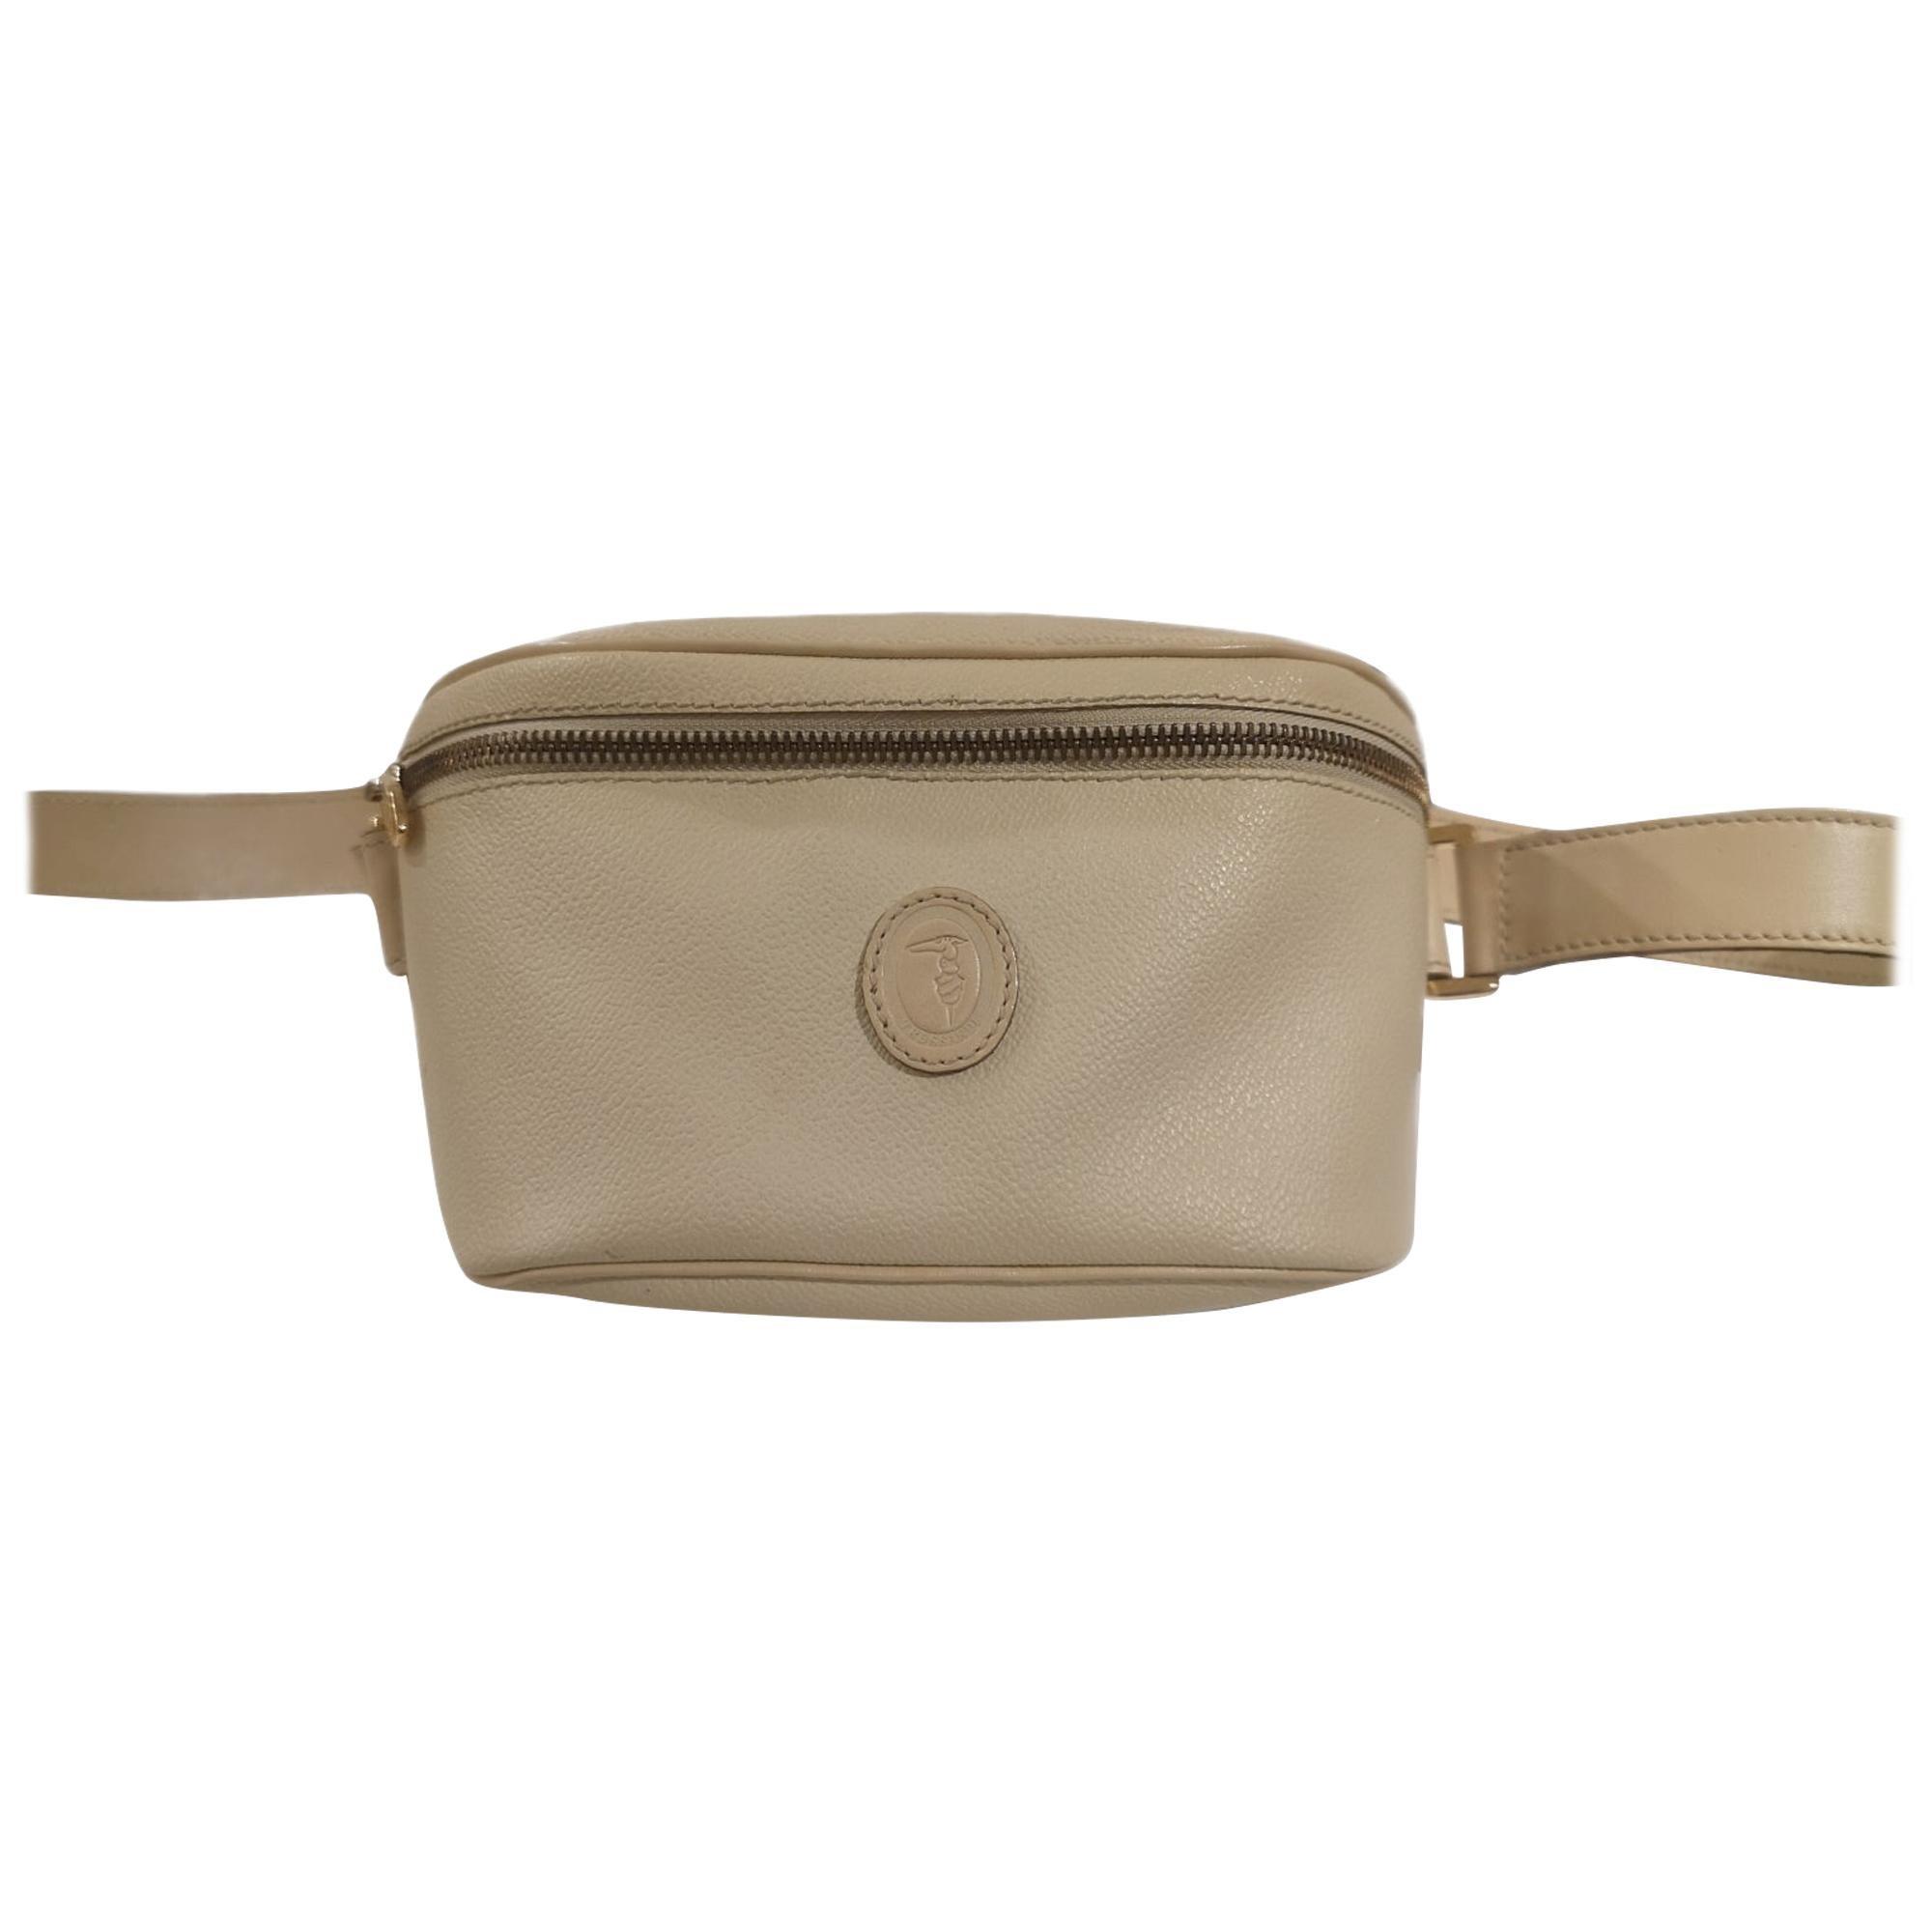 Trussardi cream leather fanny pack